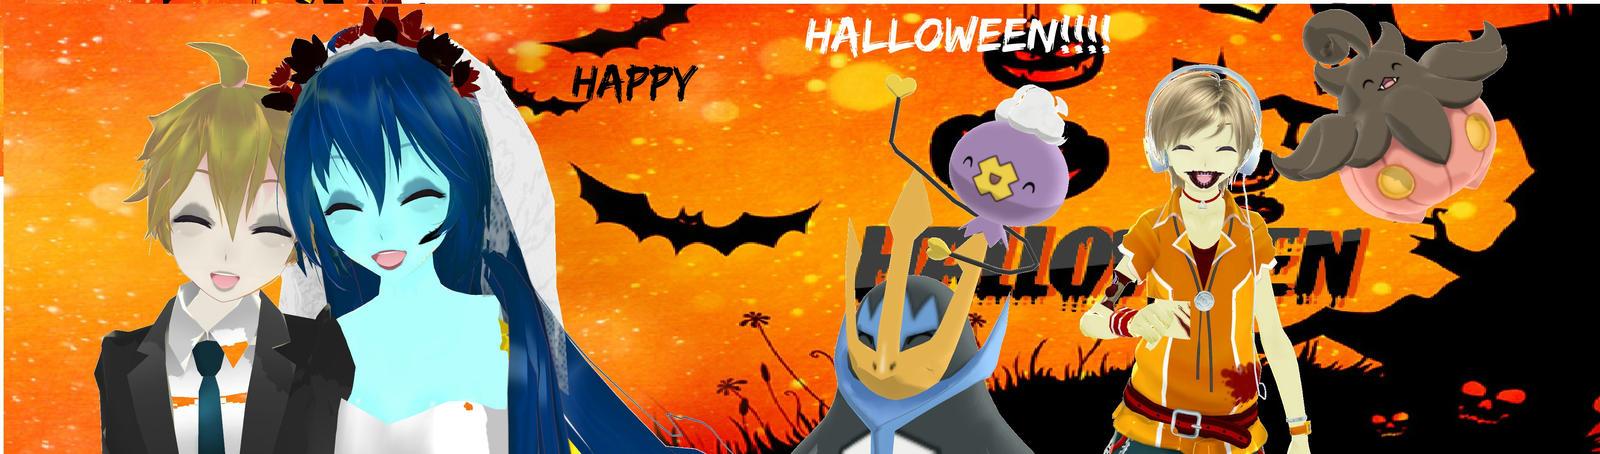 HAPPY Halloween by Guilmaster12